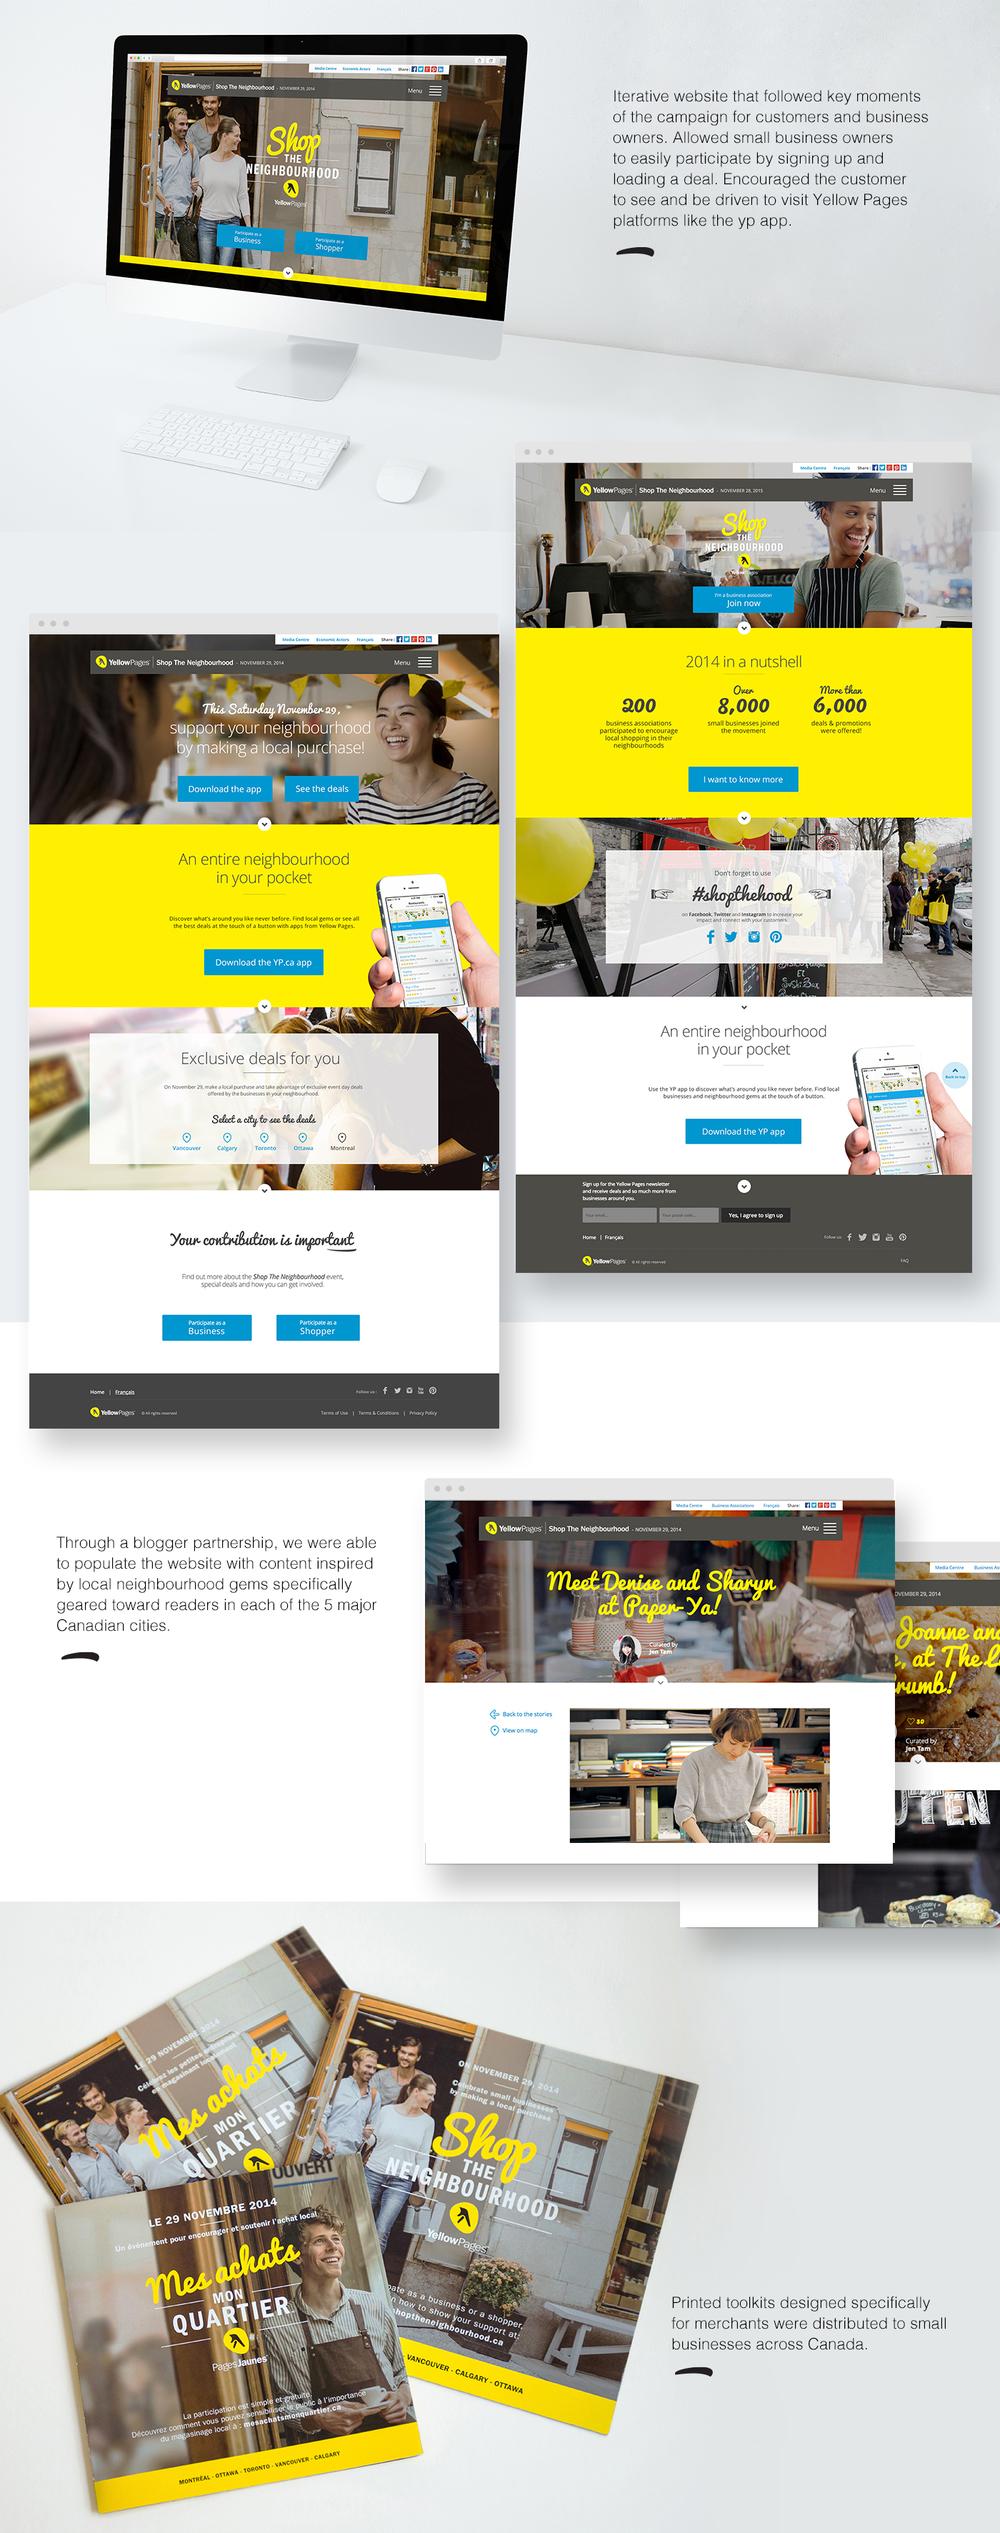 stn-behance_web.jpg